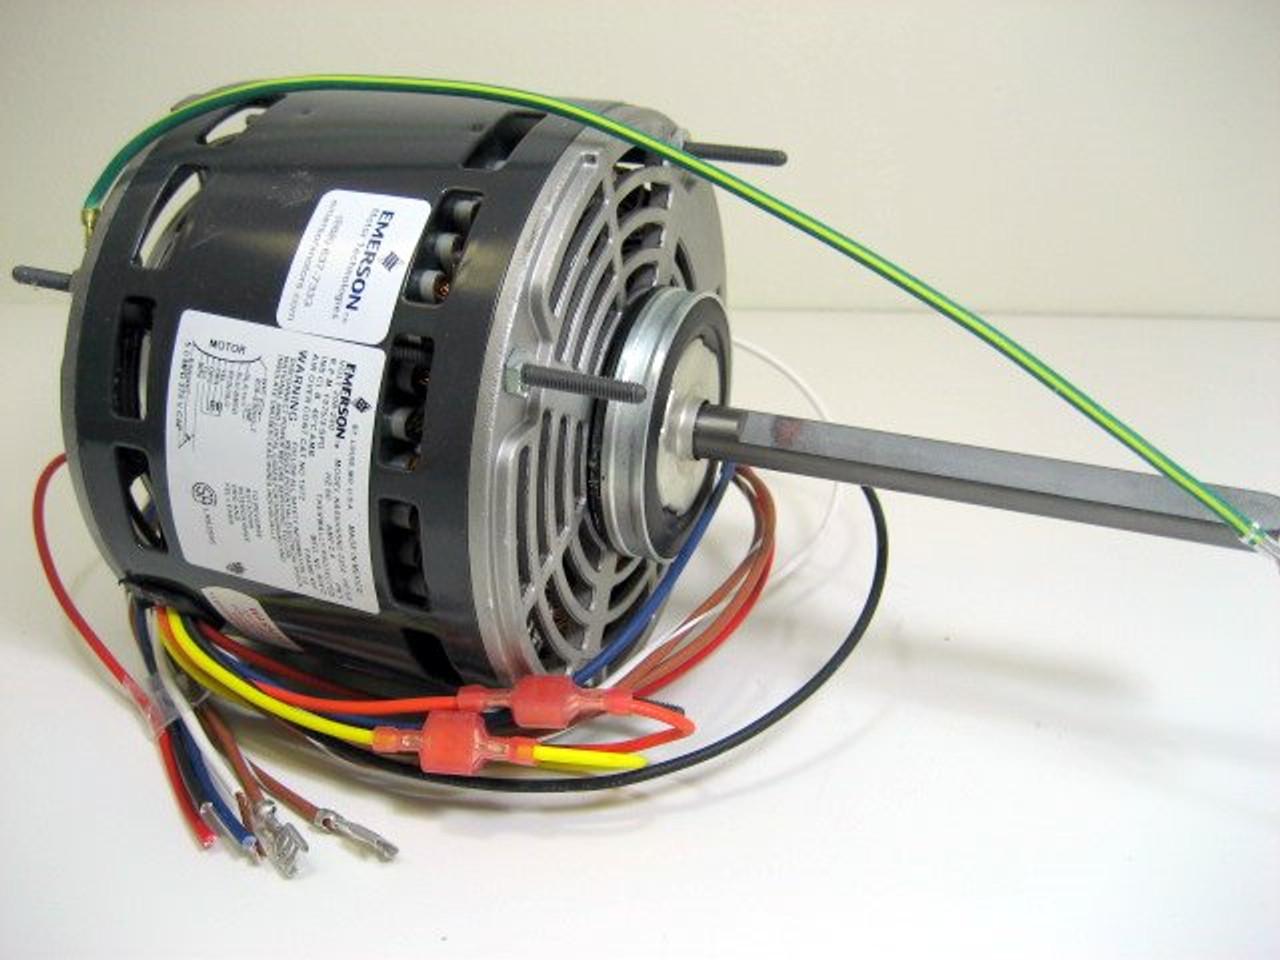 hight resolution of furnace blower motor 1 4 horse power 1075 rpm 115 volt eme1863